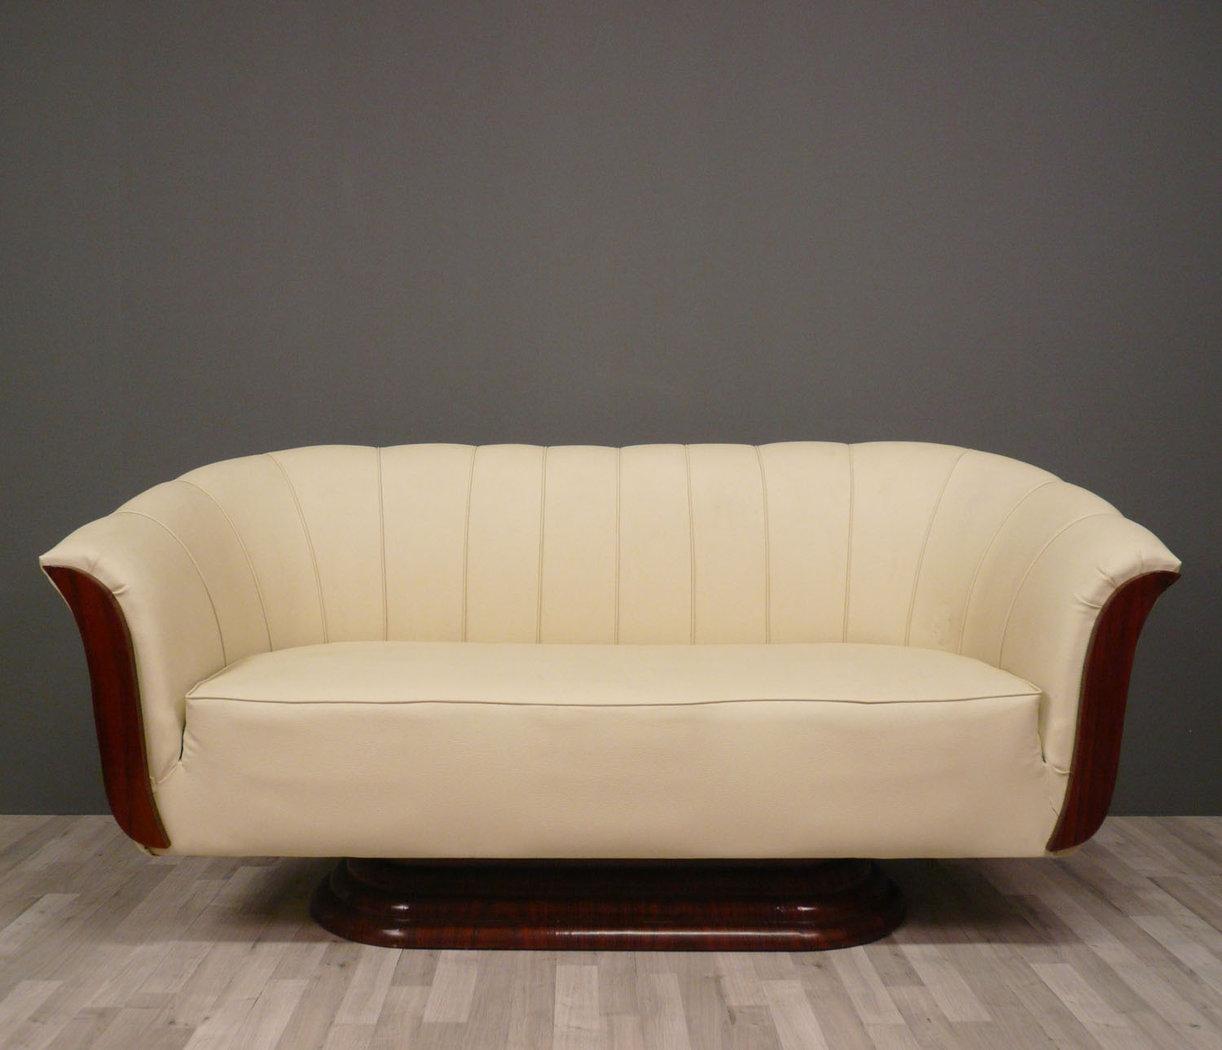 Sofas Center : Arteco Sofa Swedish Satin Birch Upholsteredrupal Throughout Art Deco Sofa And Chairs (Image 18 of 20)